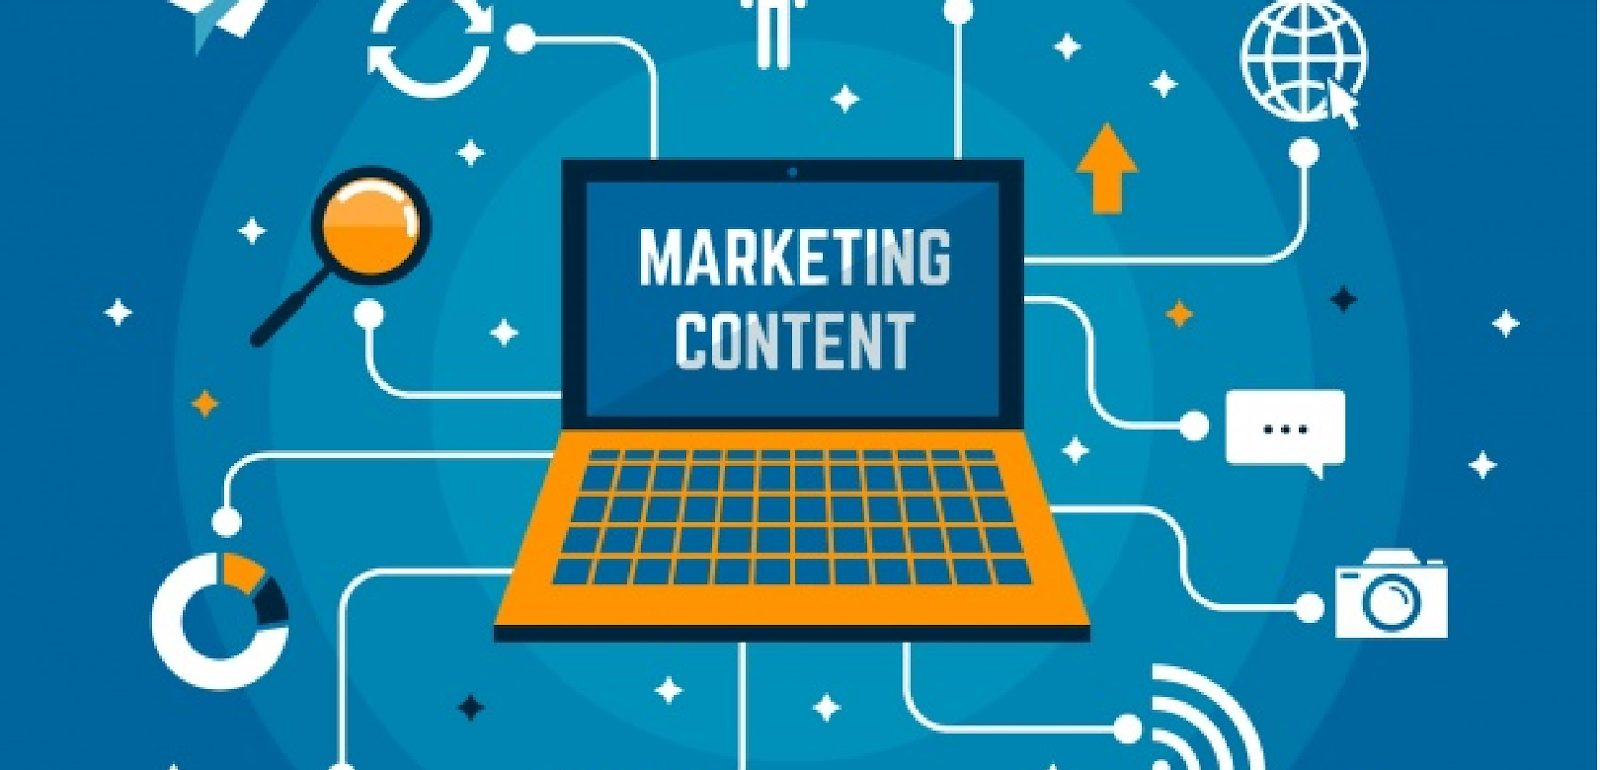 marketing content graphic